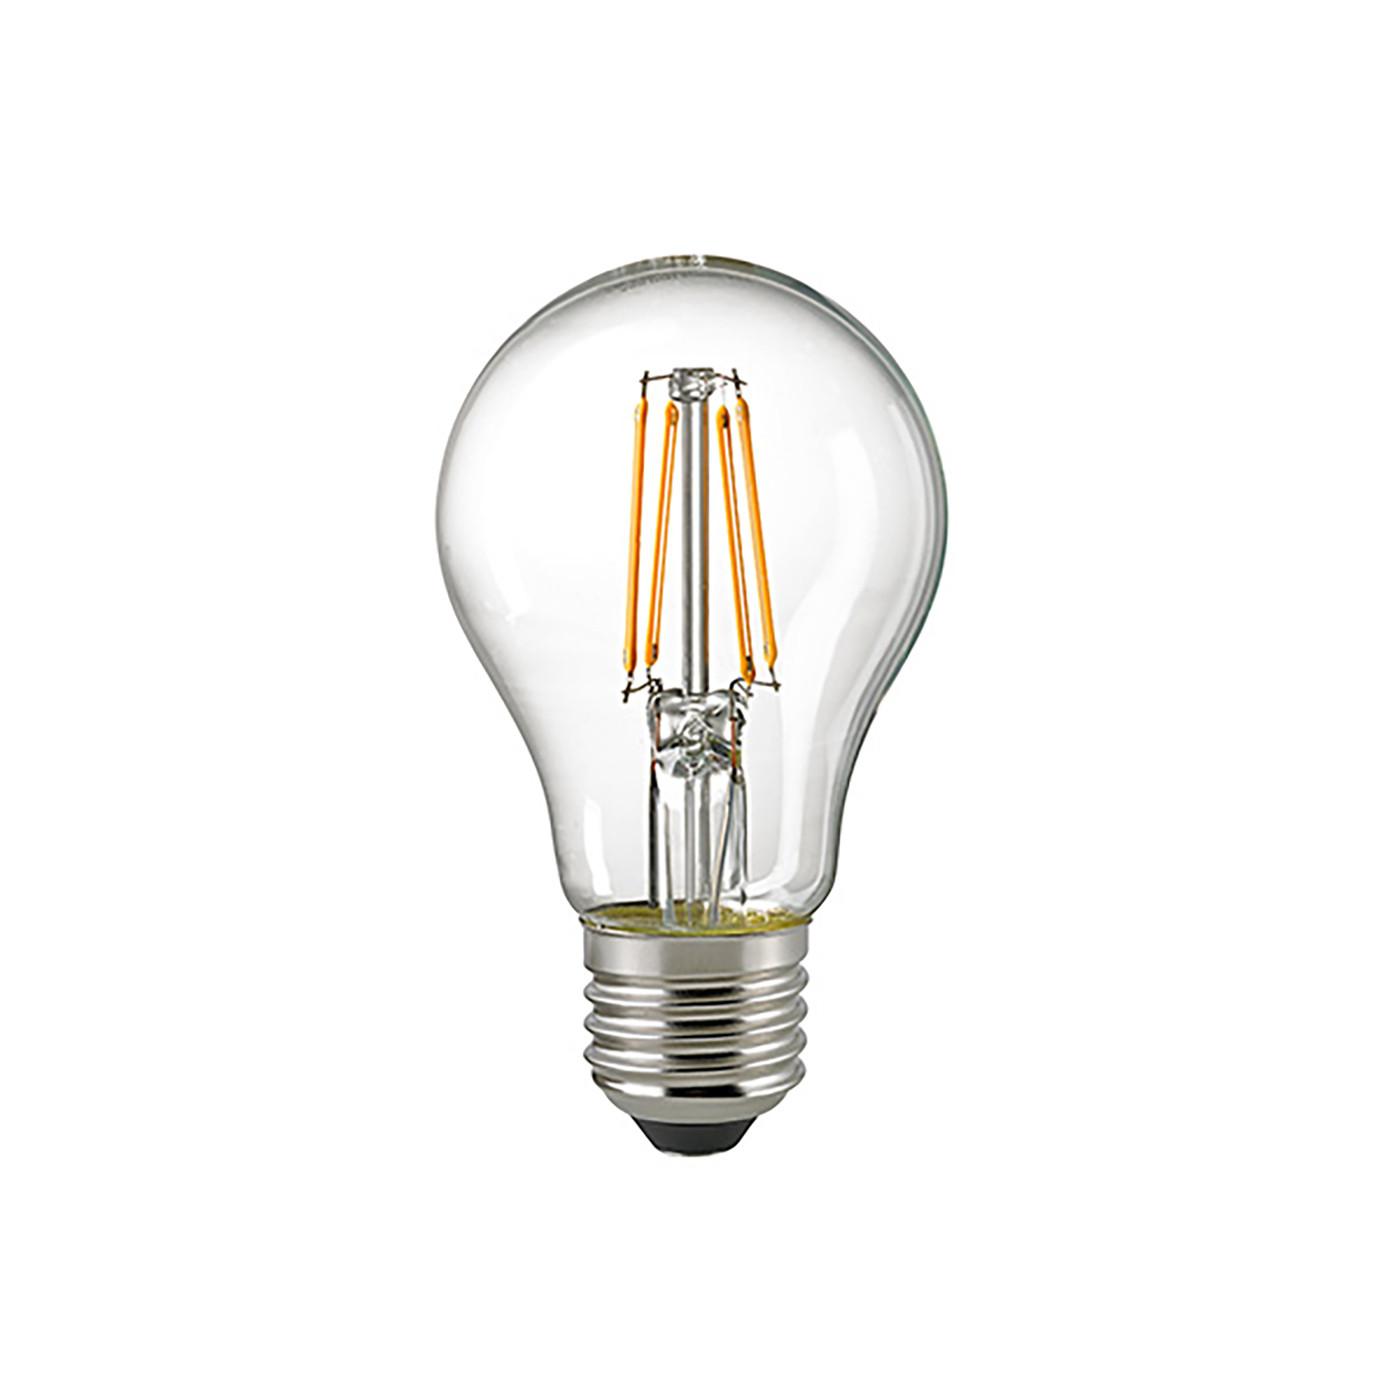 Sigor LED filament bulb shaped A67 10W 2700K 230V E27 clear